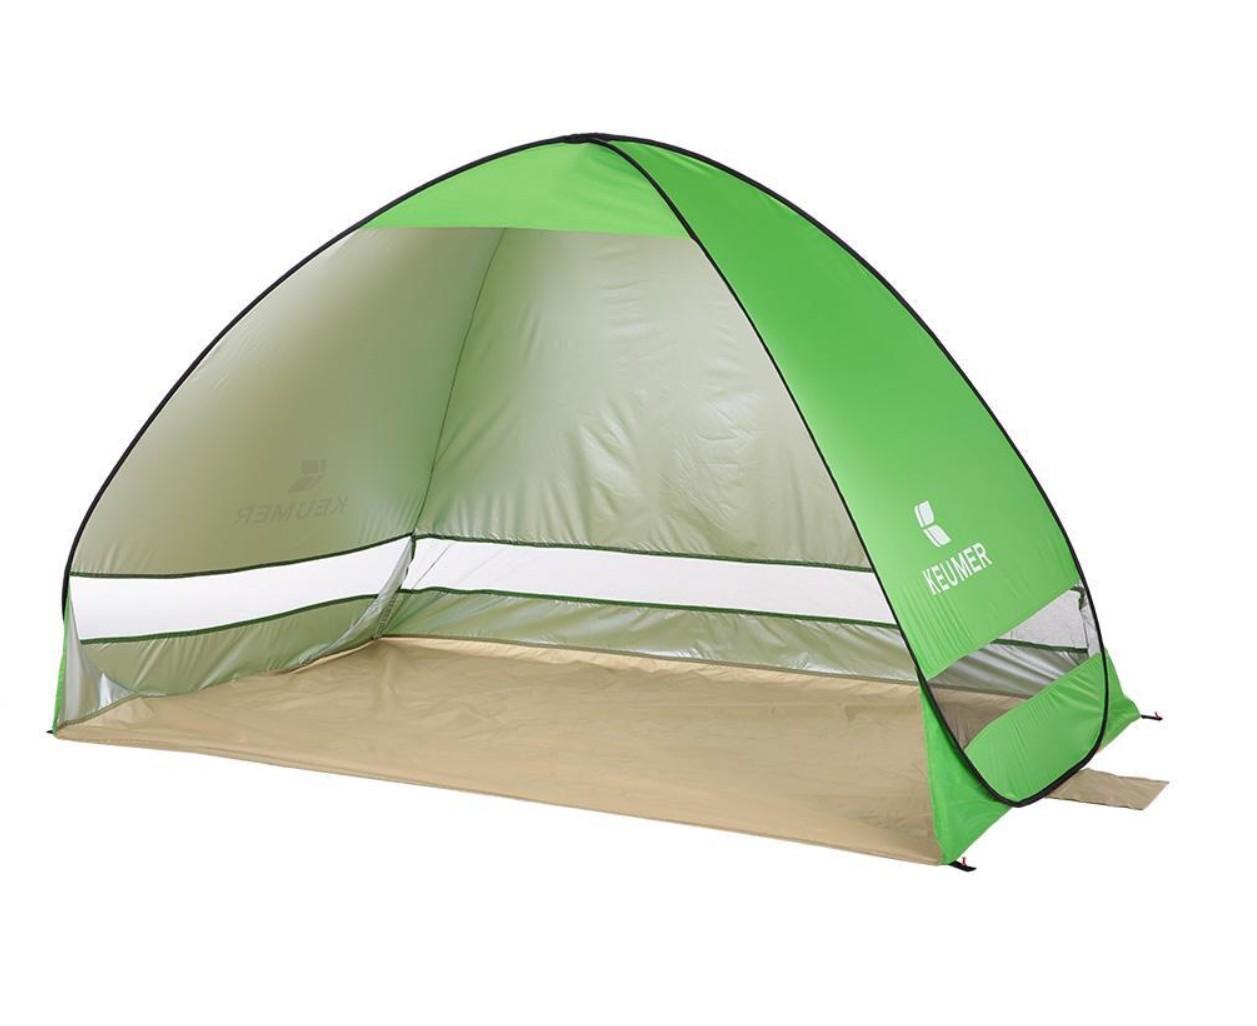 Cort Pentru Plaja Verde Deschis Anti-UV Tip Pop-up pentru 2 Persoane Marime 200x120x130cm imagine techstar.ro 2021